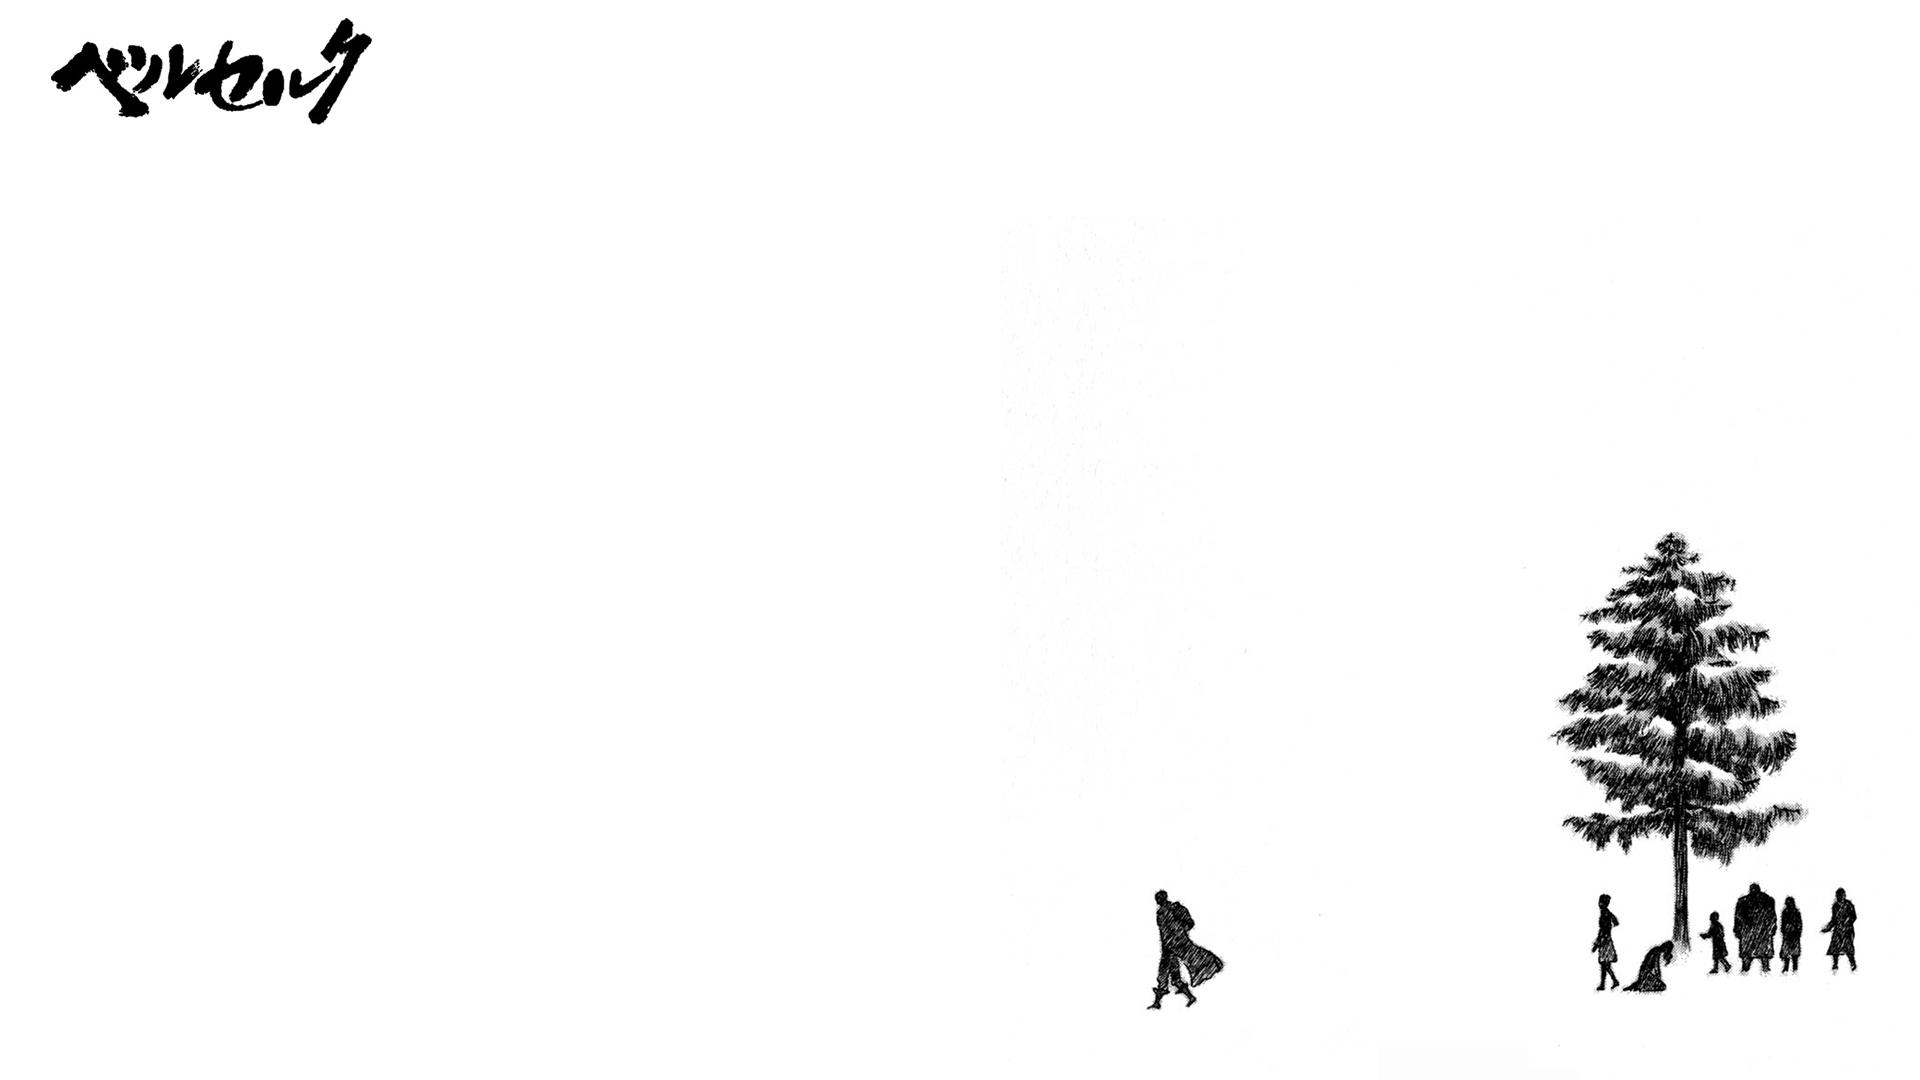 Goodbye wallpaper by sirarles 1920x1080